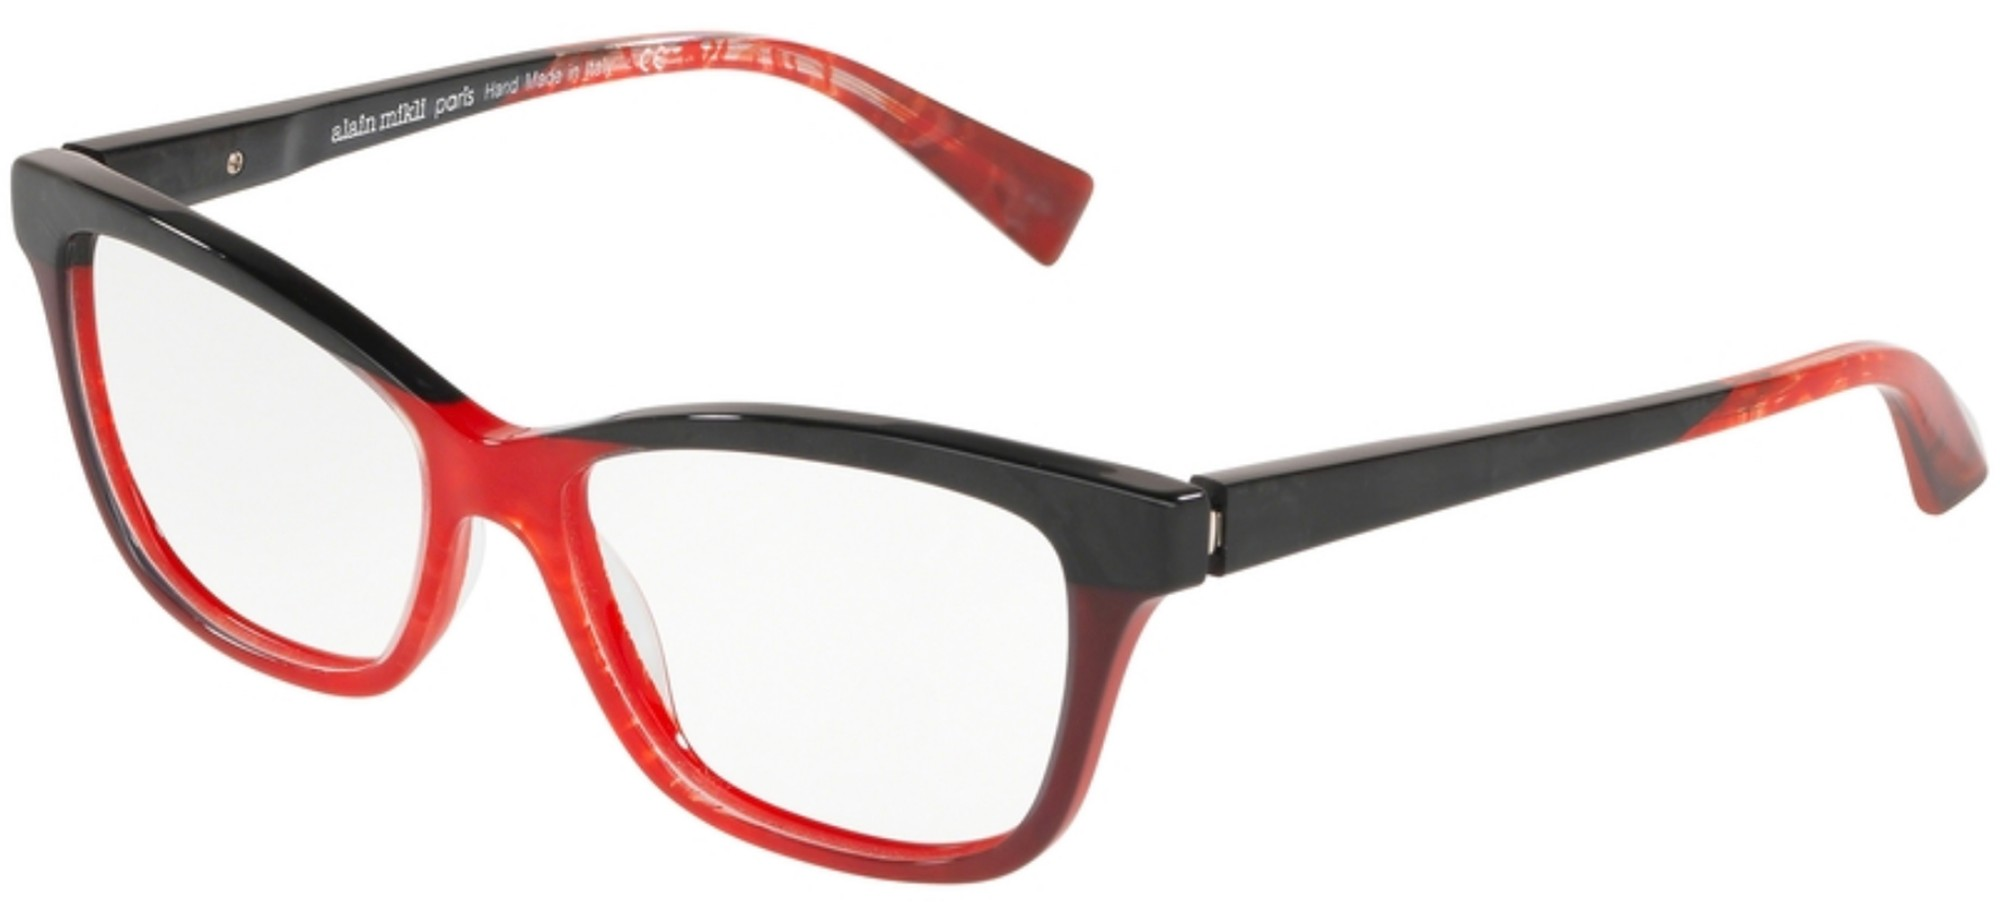 Alain Mikli eyeglasses FASCINATION 0A03037